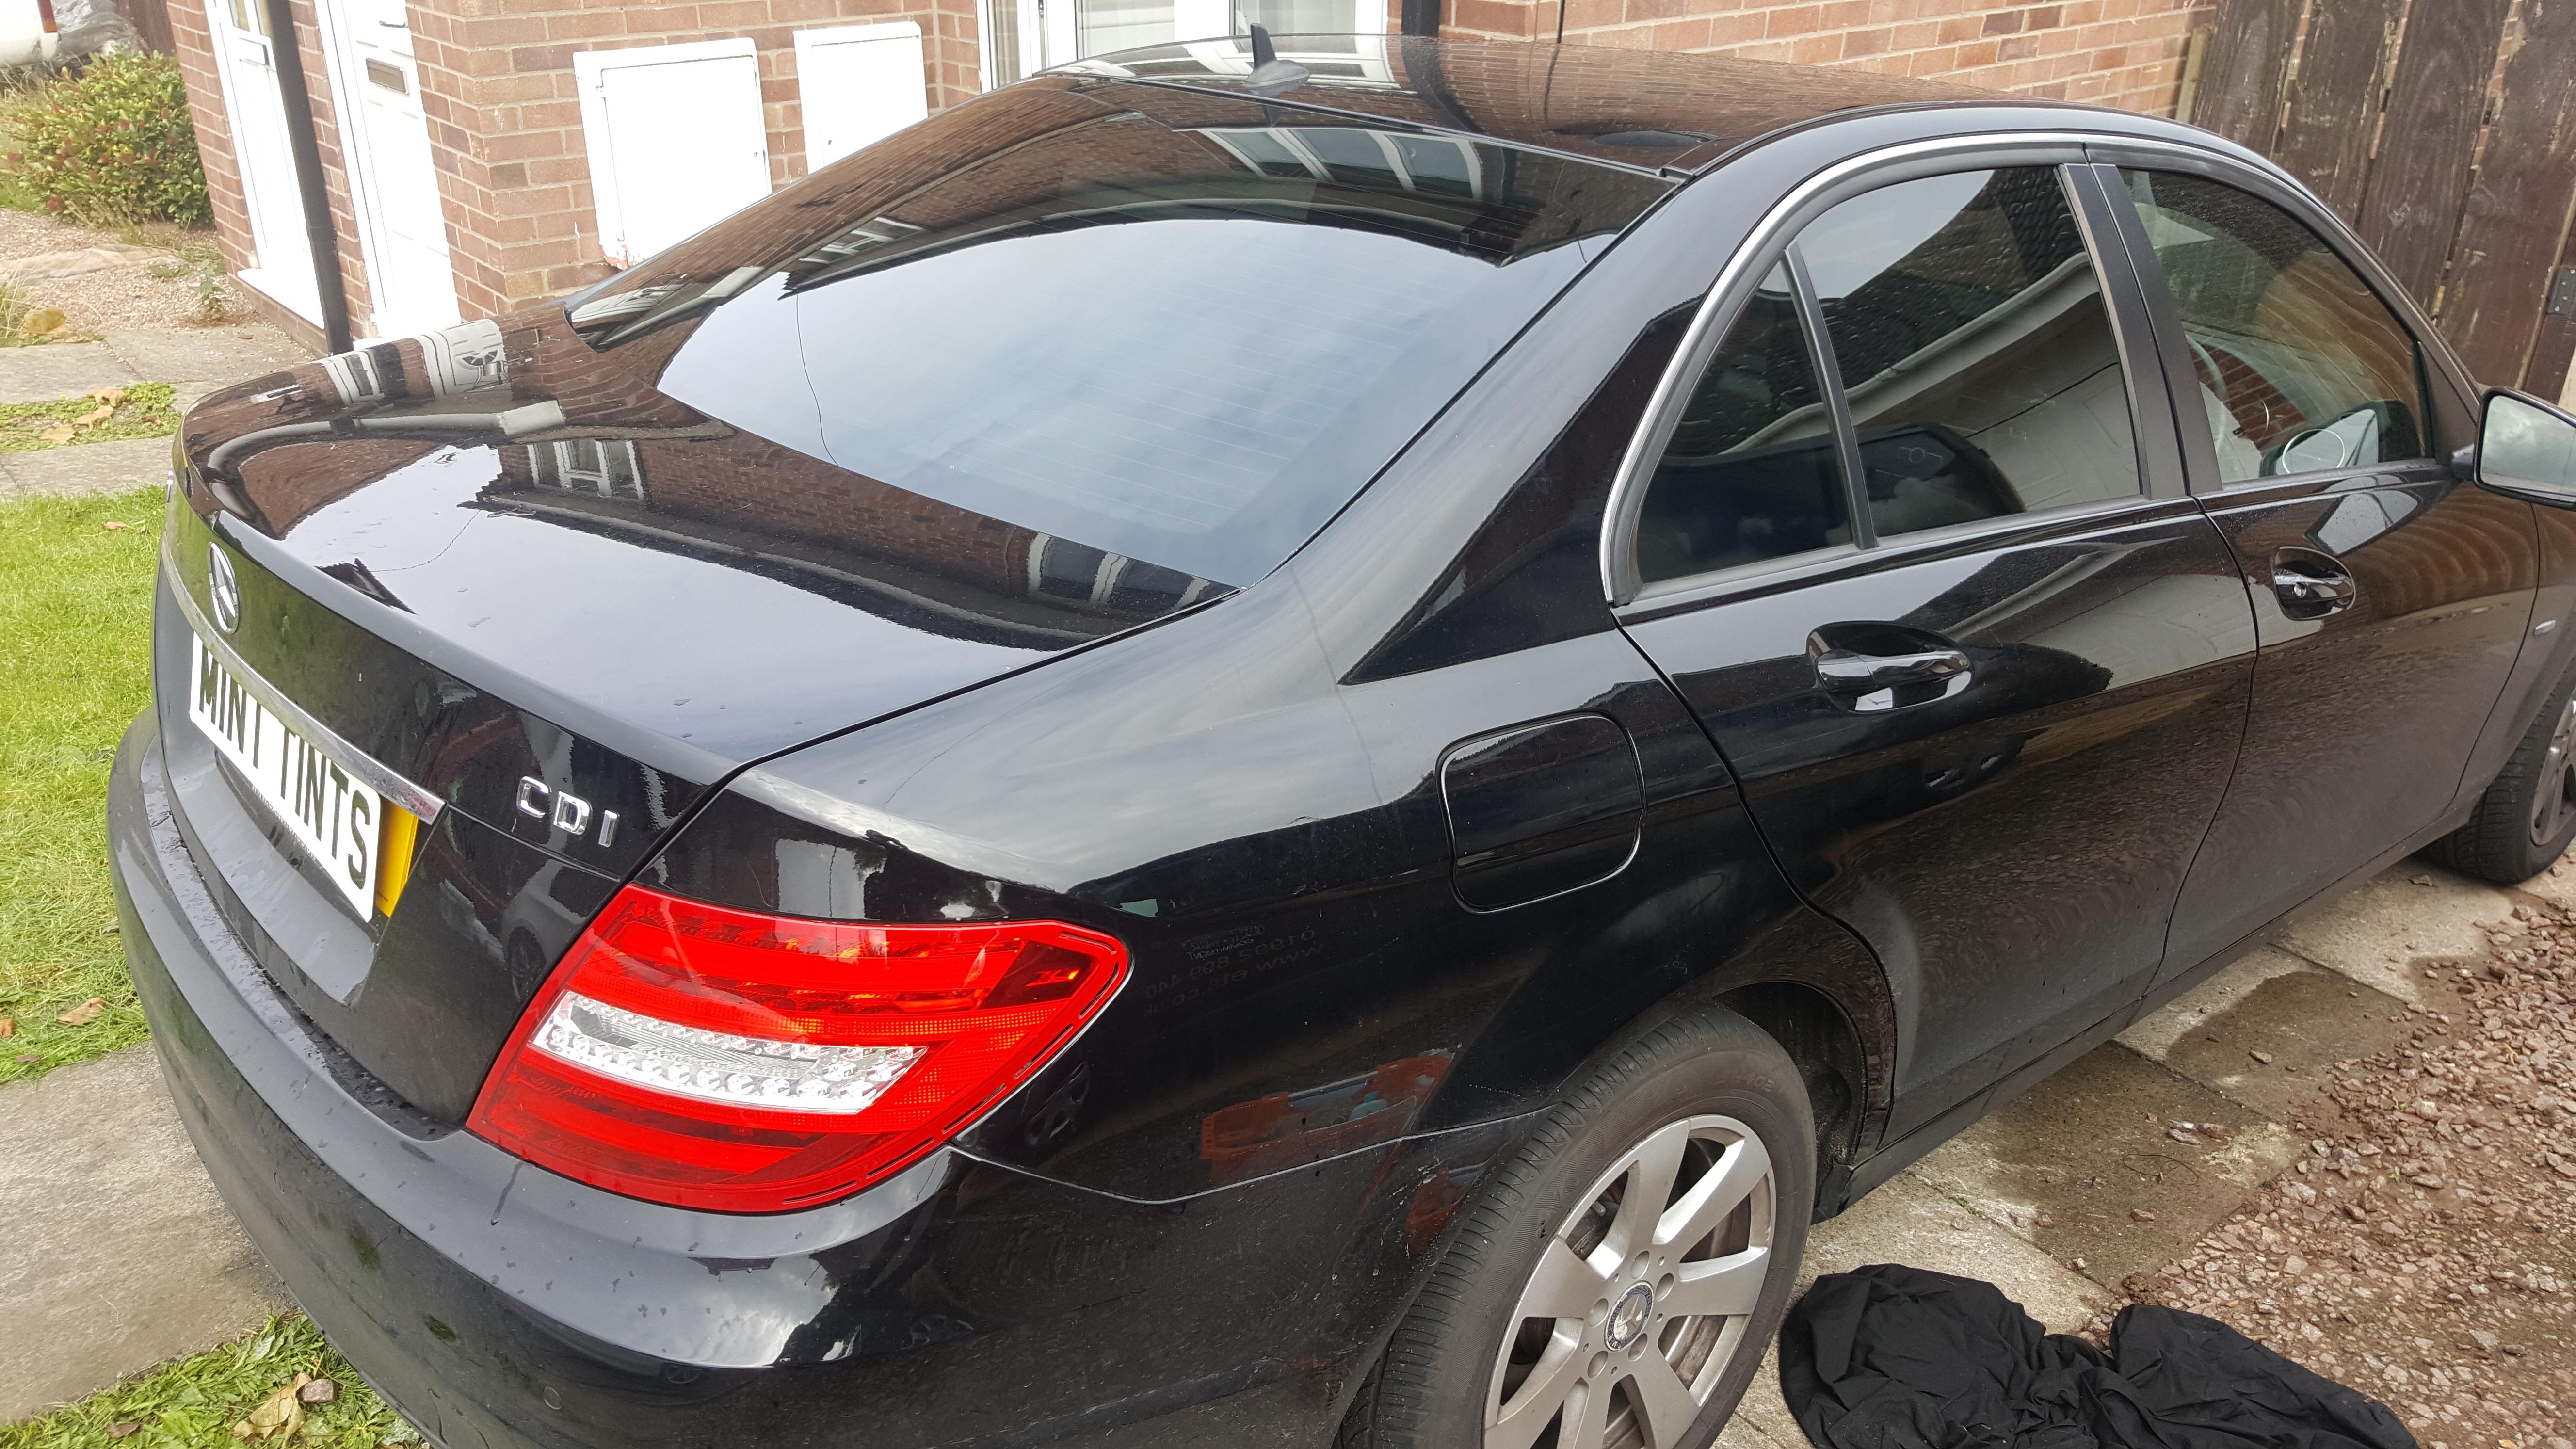 Mercedes C220 - 20% Dark Smoke